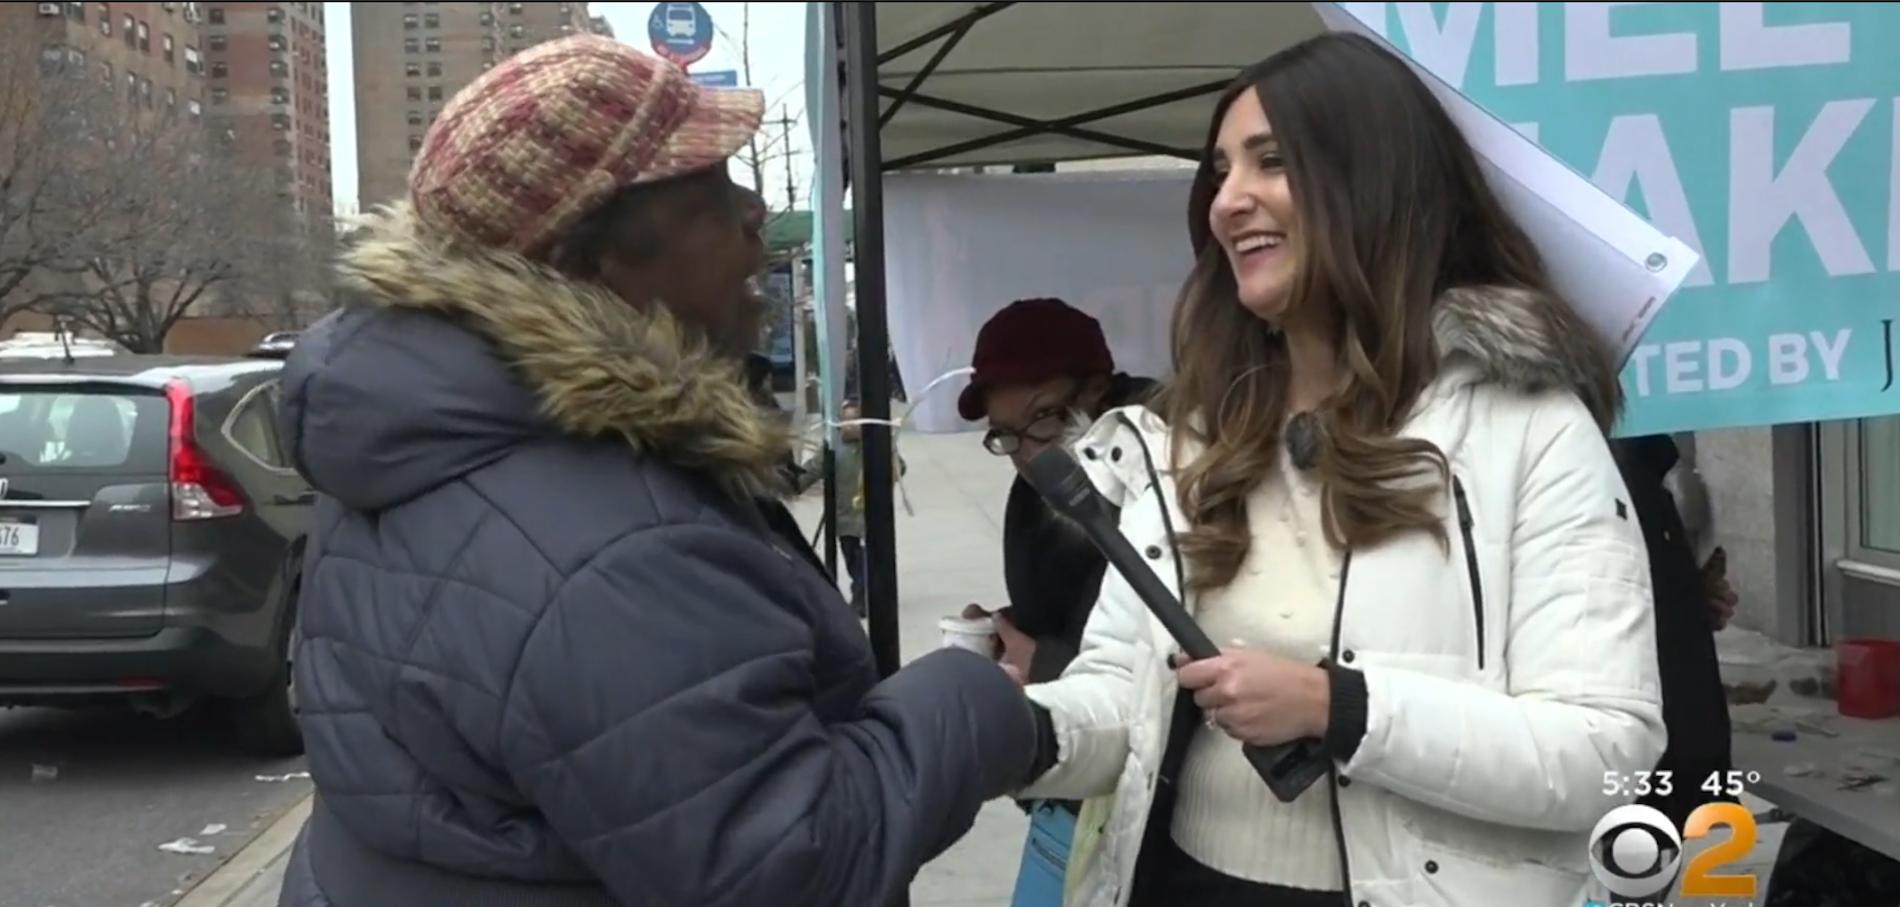 """Meet a Jew in the City"" Harlem Pop-Up on CBS News"